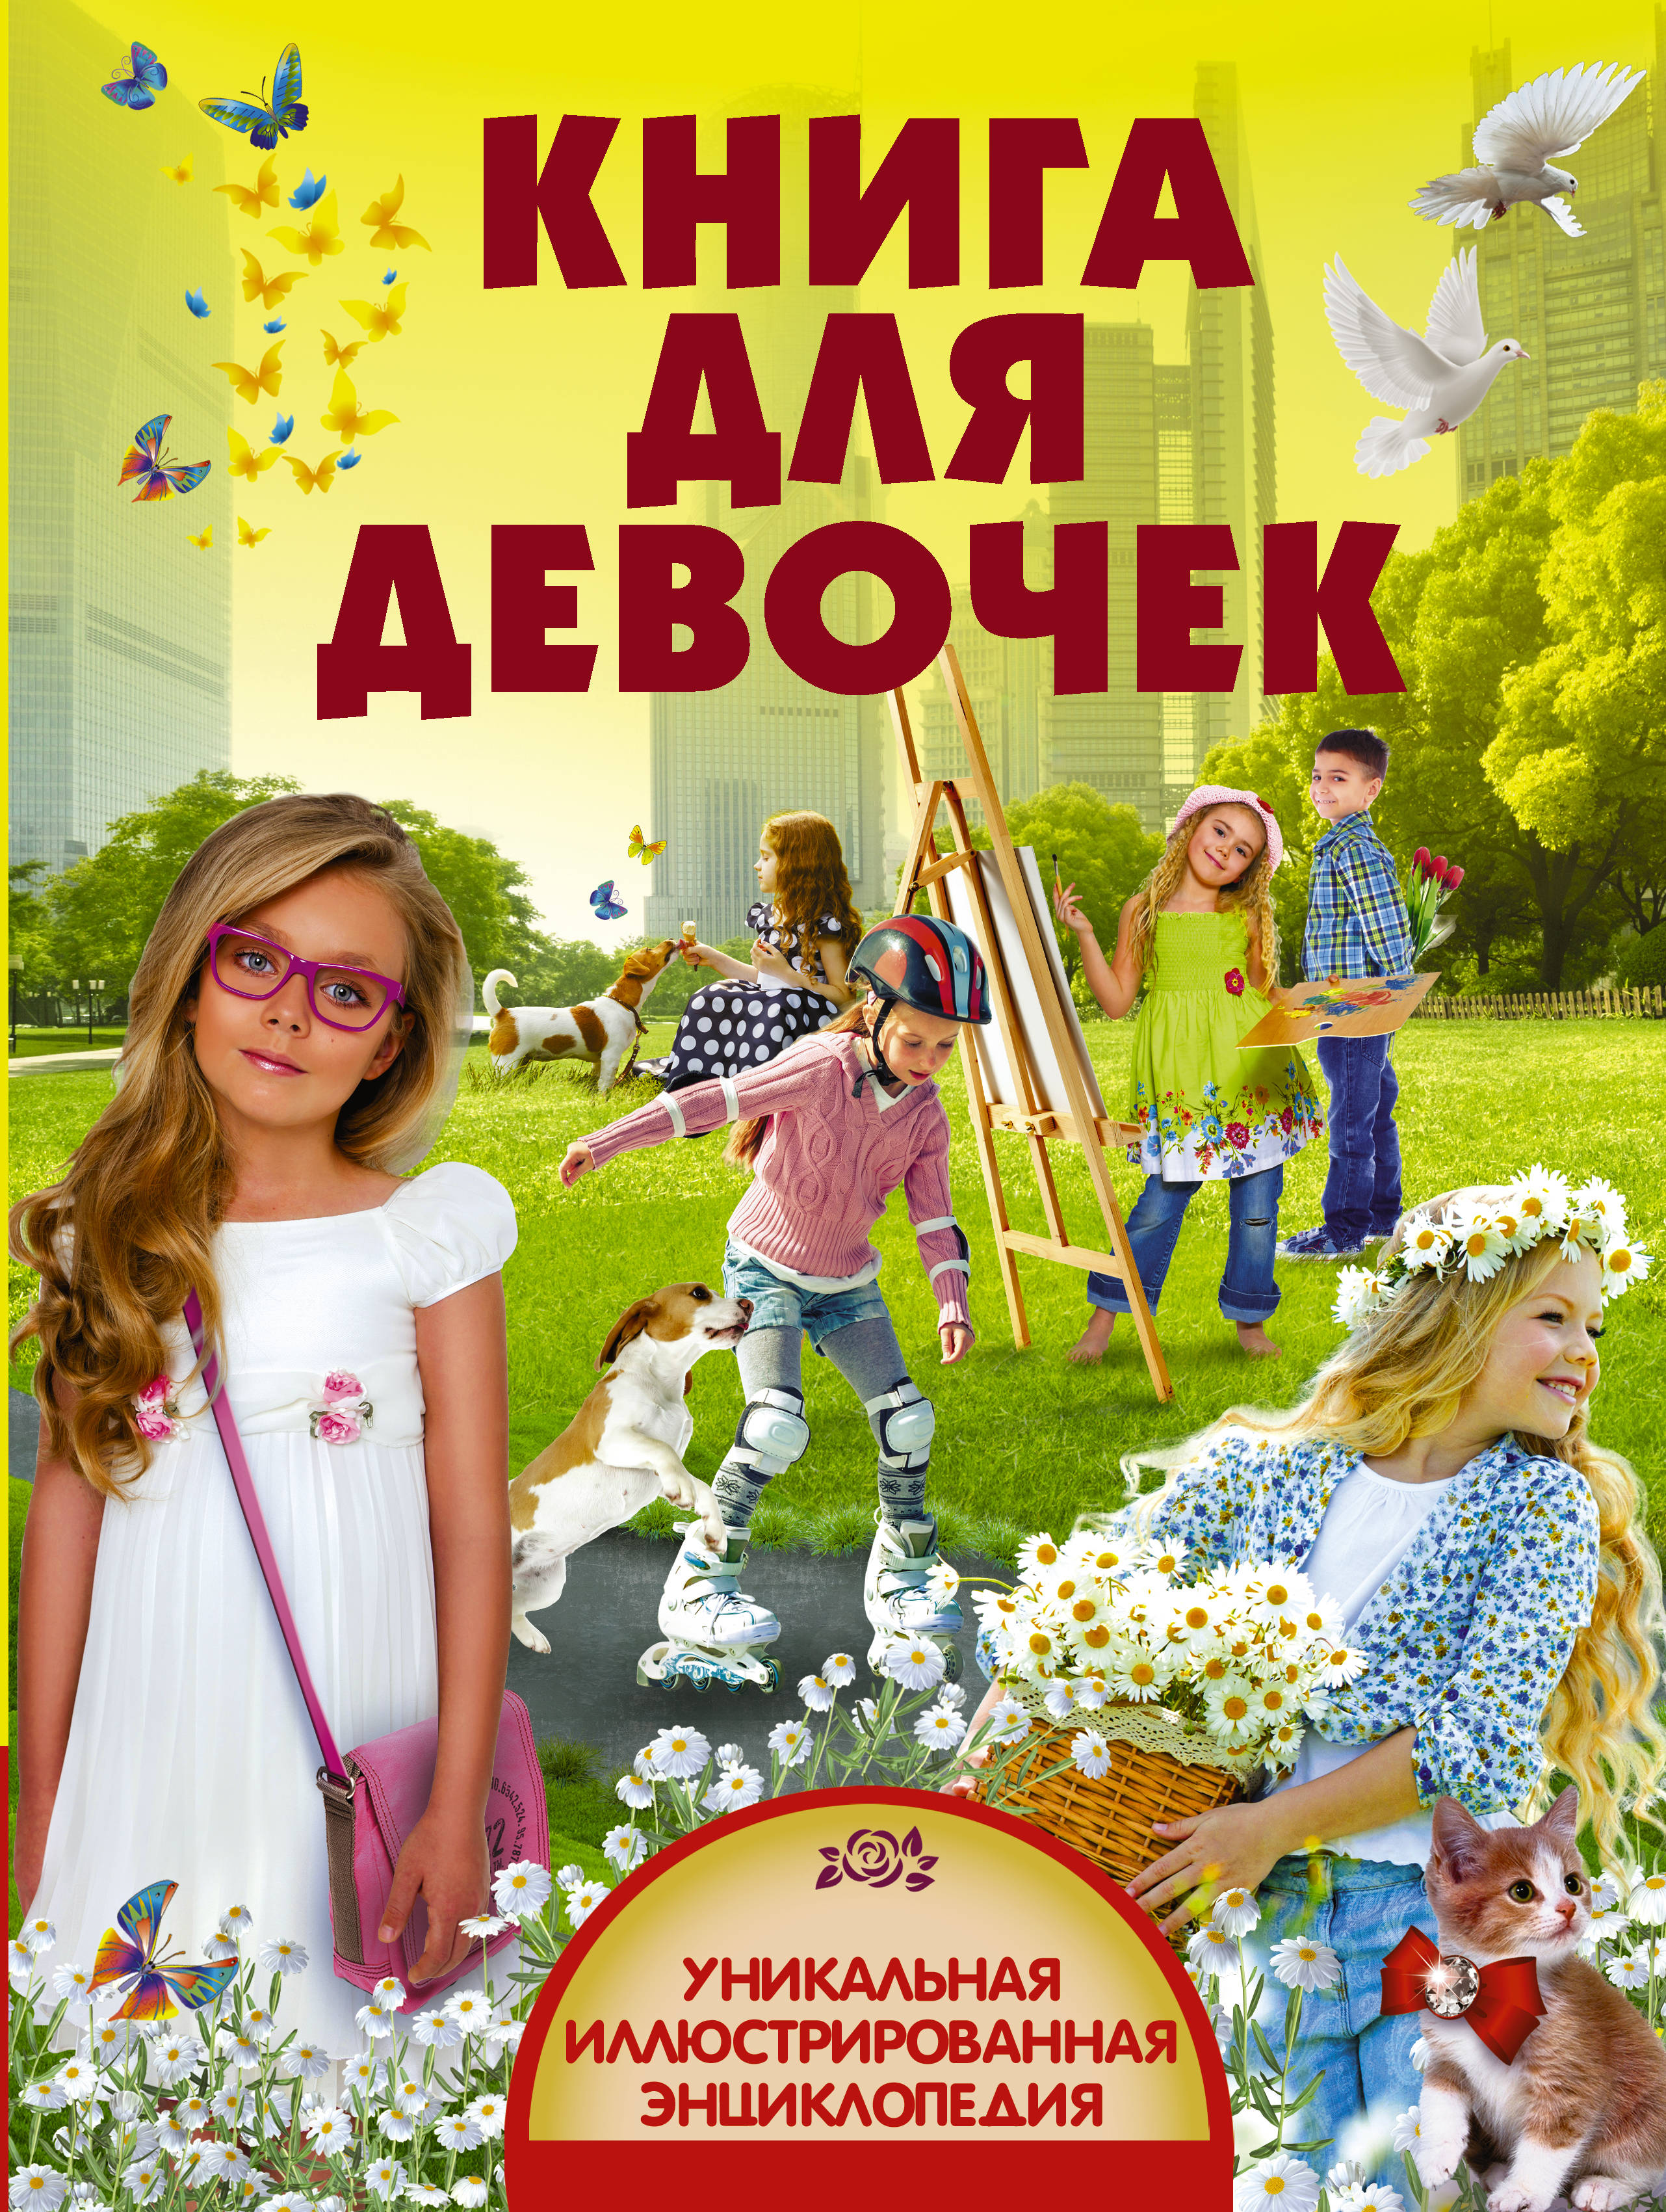 Д. В. Кошевар, Е. А. Папуниди, Е. О. Хомич Книга для девочек